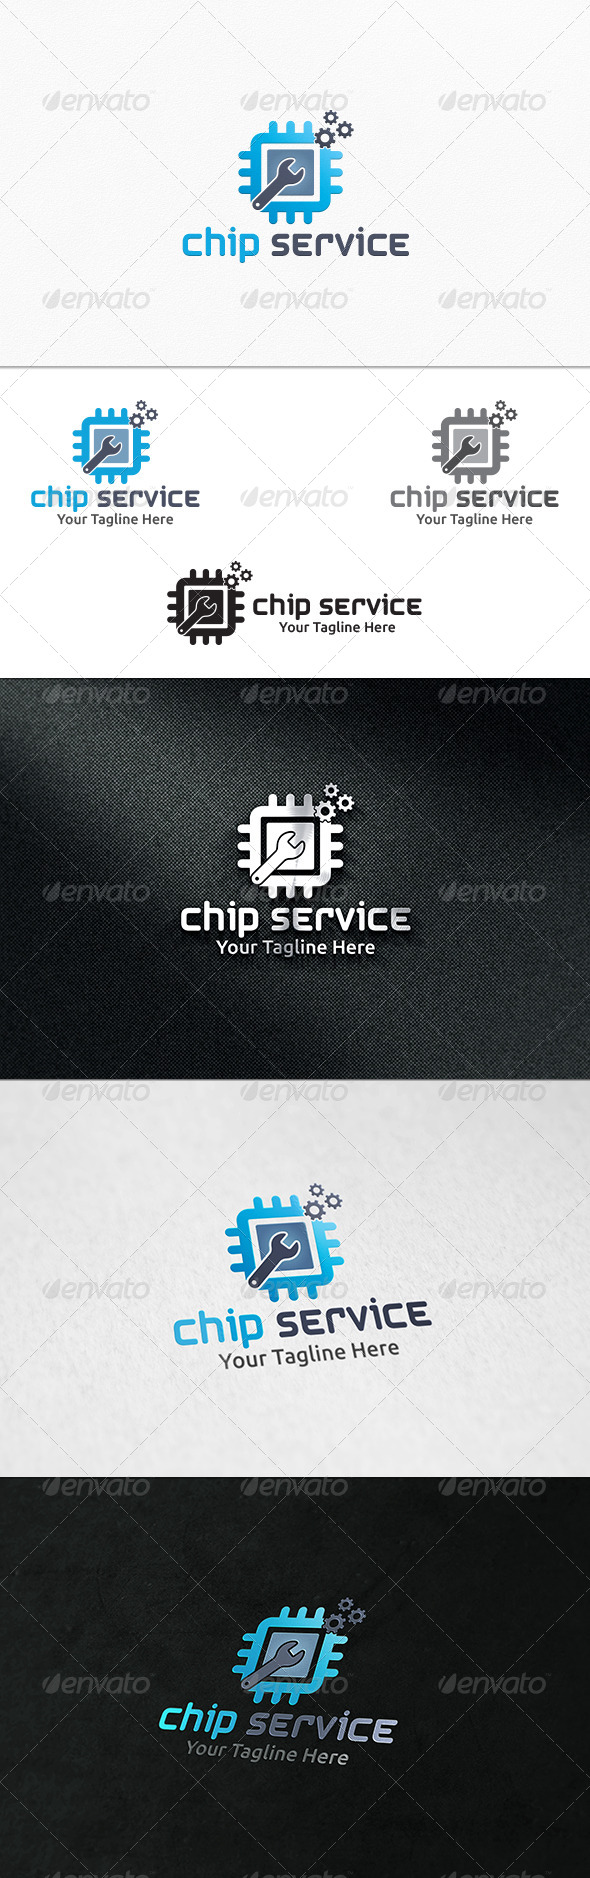 GraphicRiver Chip Service Logo Template 7931501